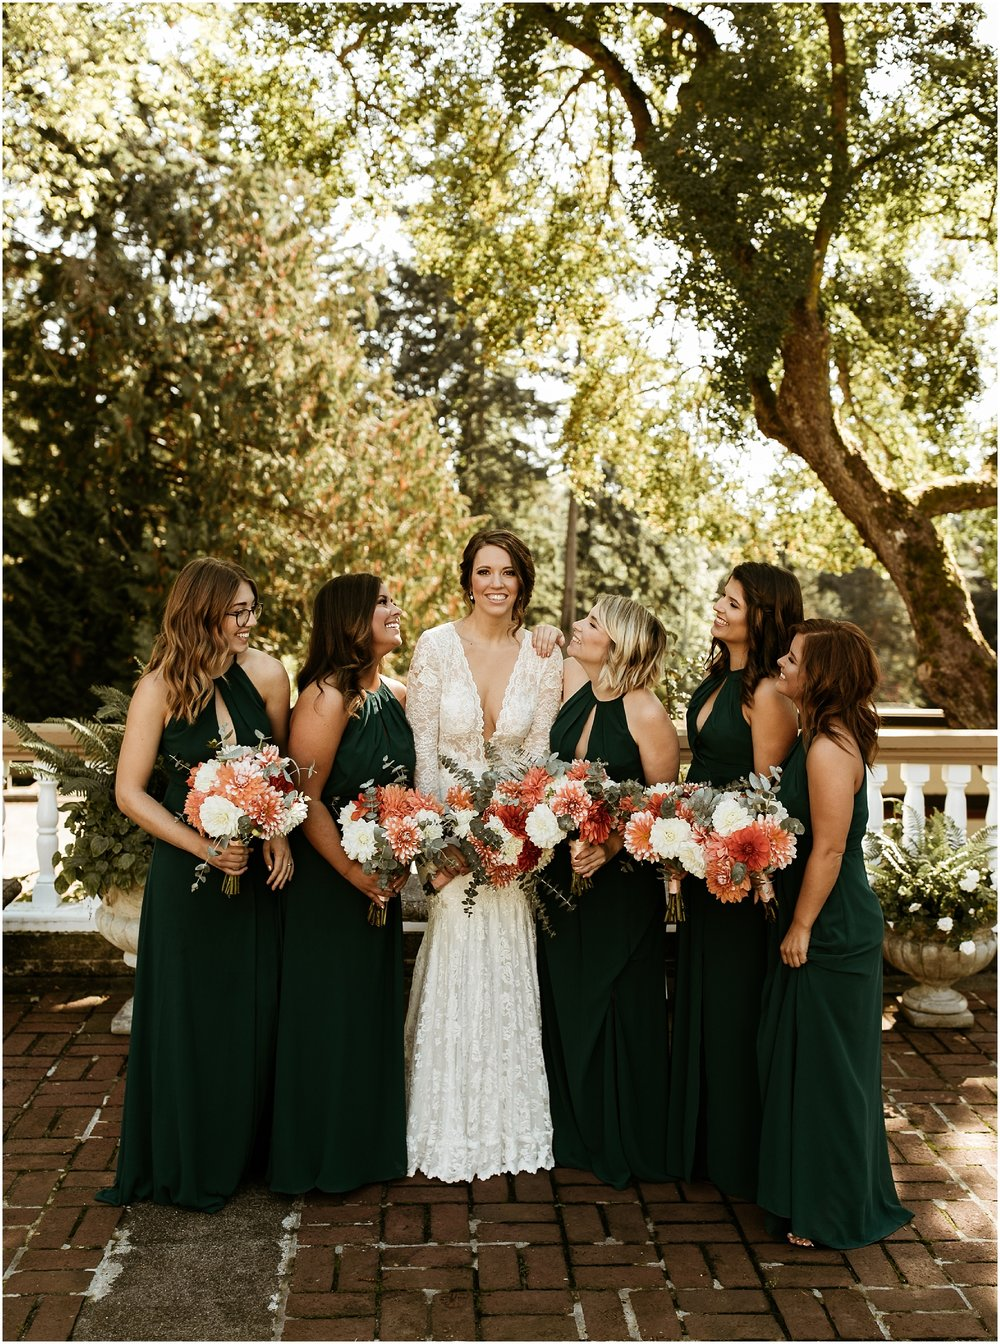 Lairmont Manor Wedding Bellingham Cassie Trottier Photo1018.jpg